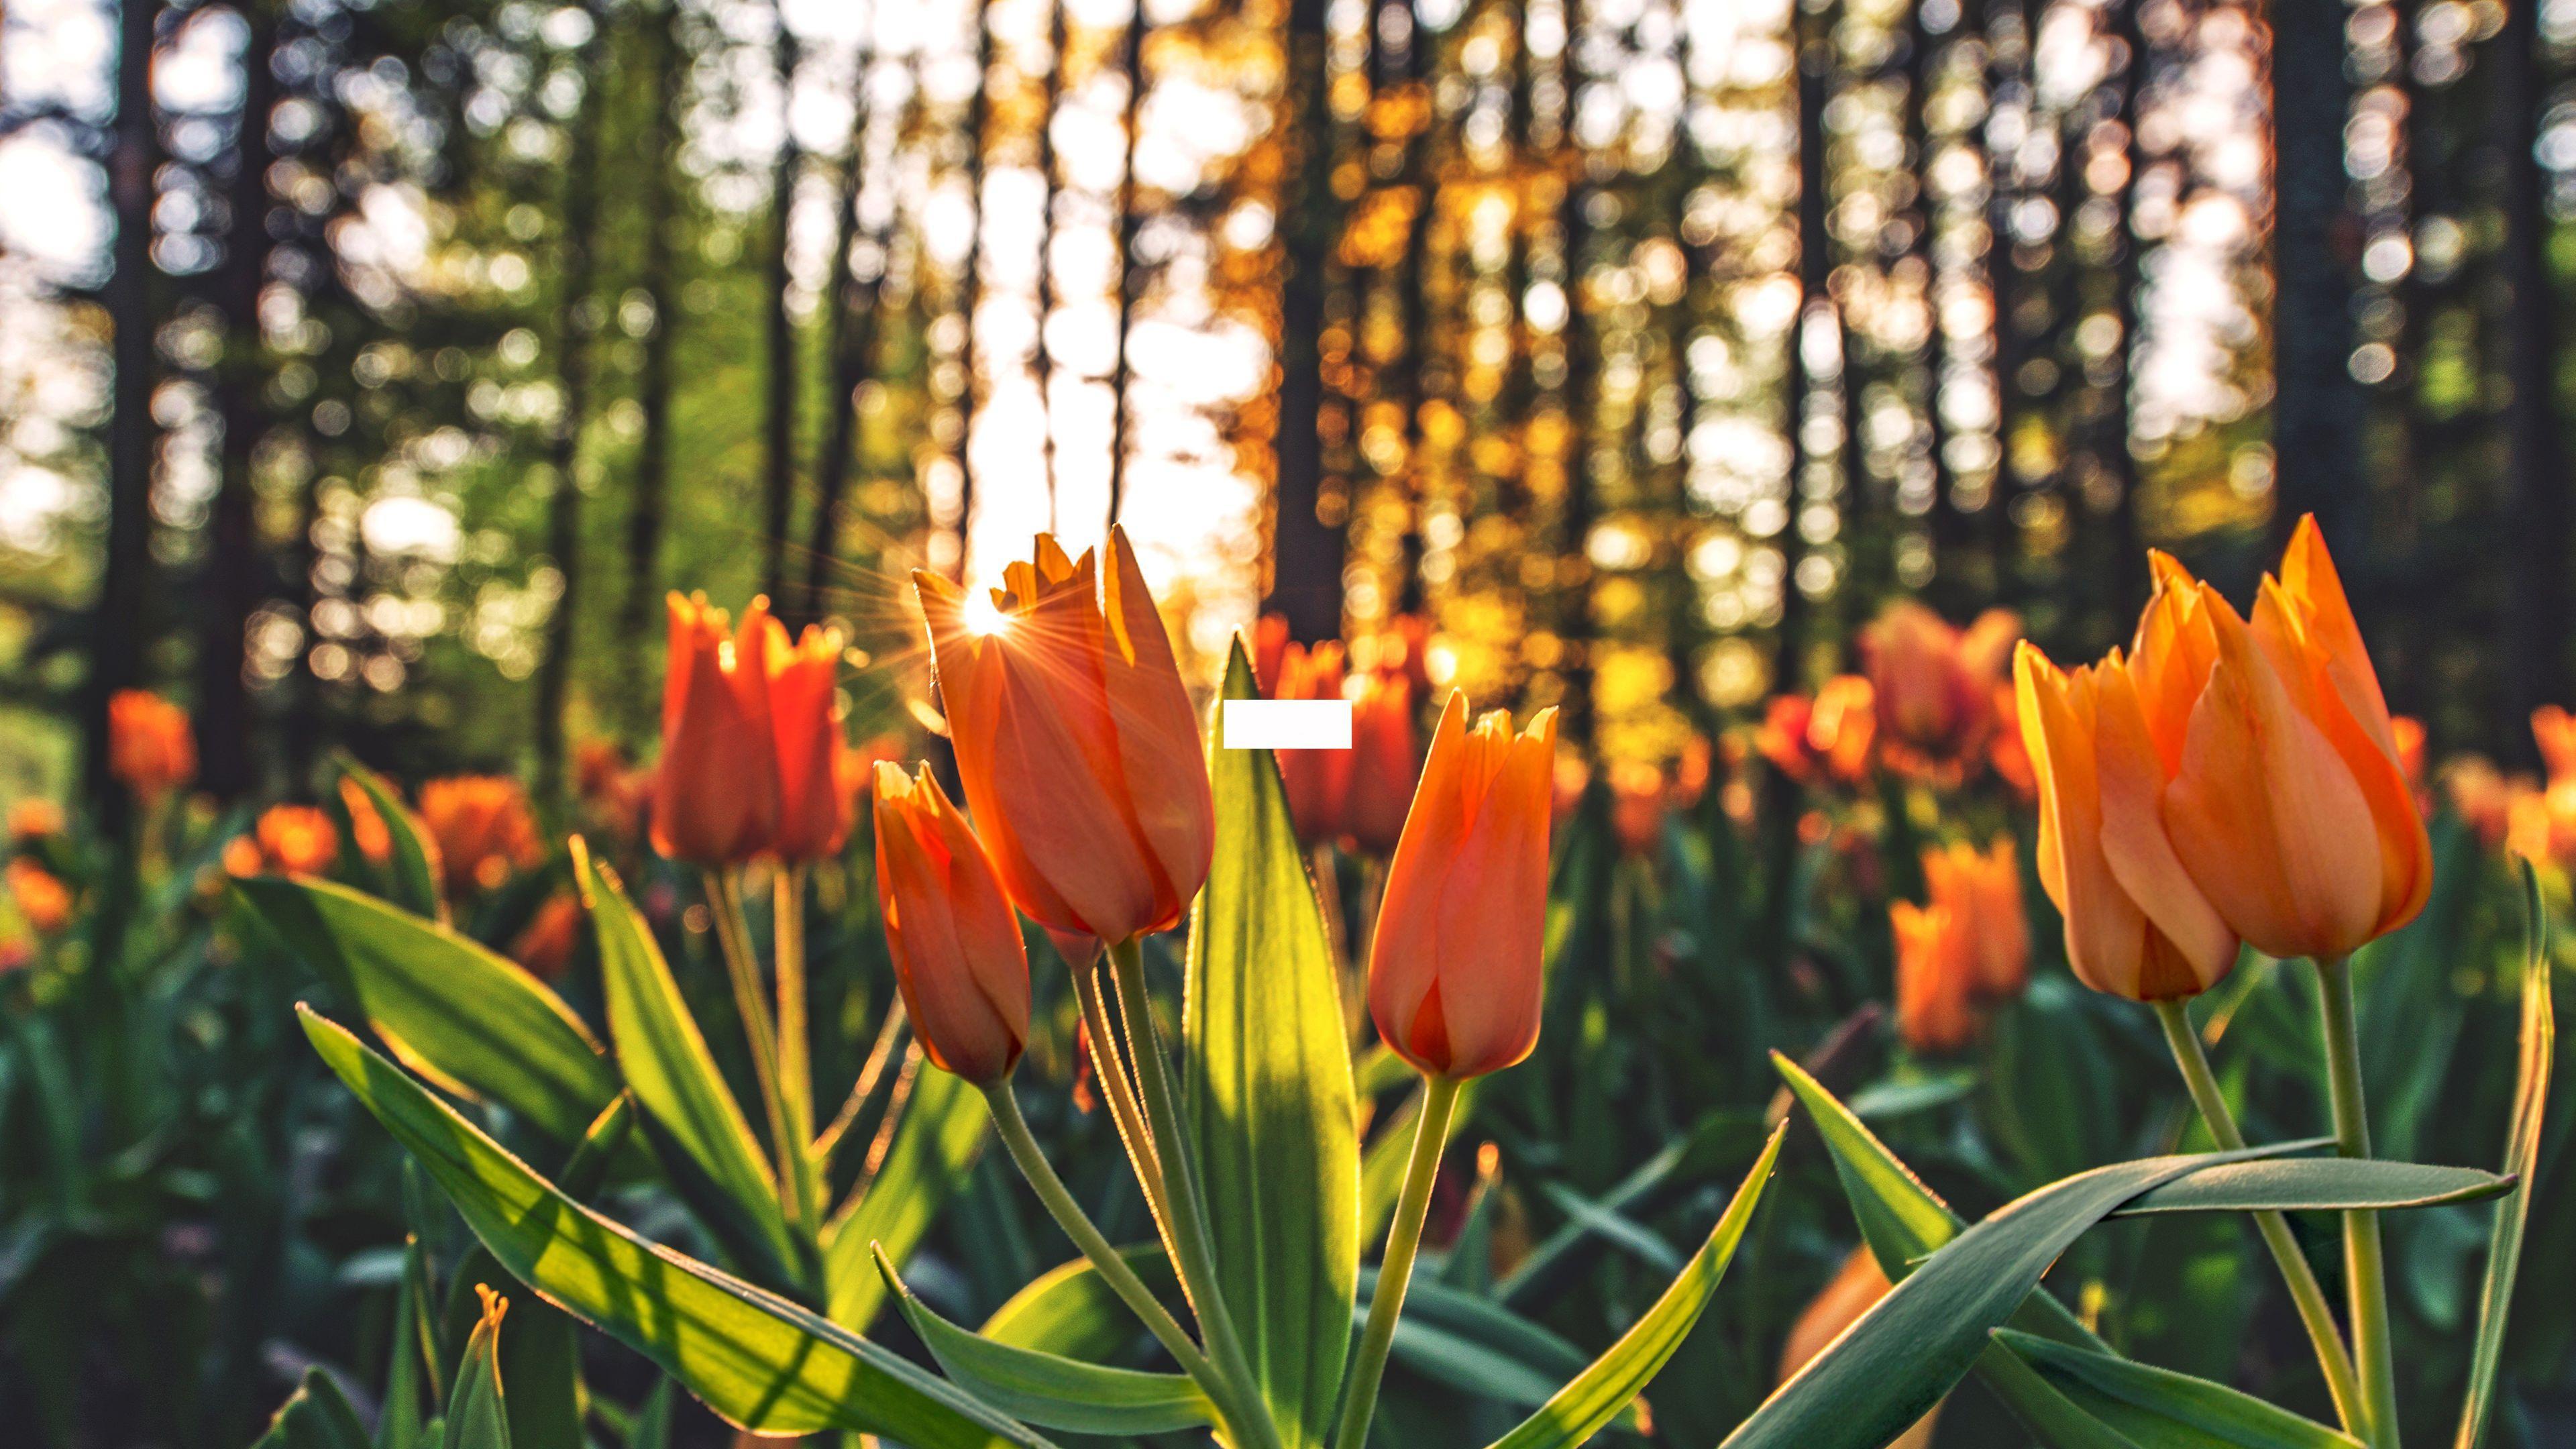 3840x2160 Nền hoa mát mẻ MIỄN PHÍ trong PSD.  AI